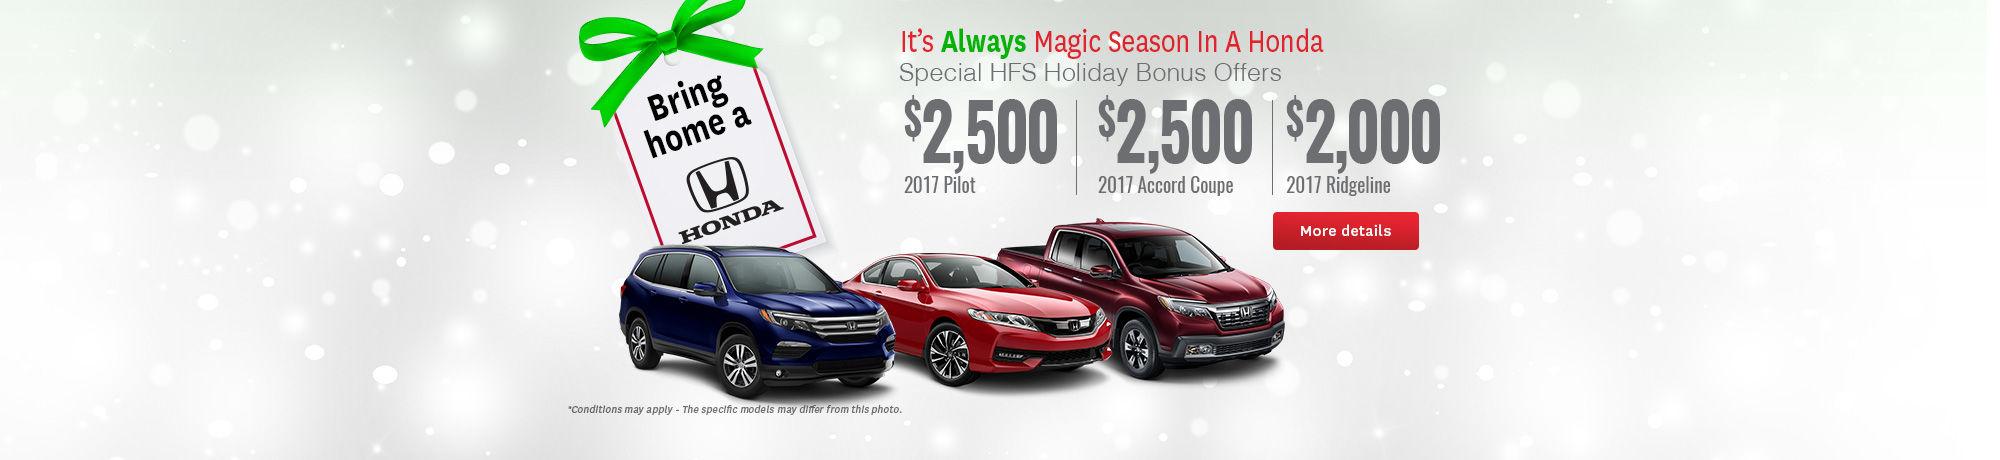 Bring Home a Honda - December